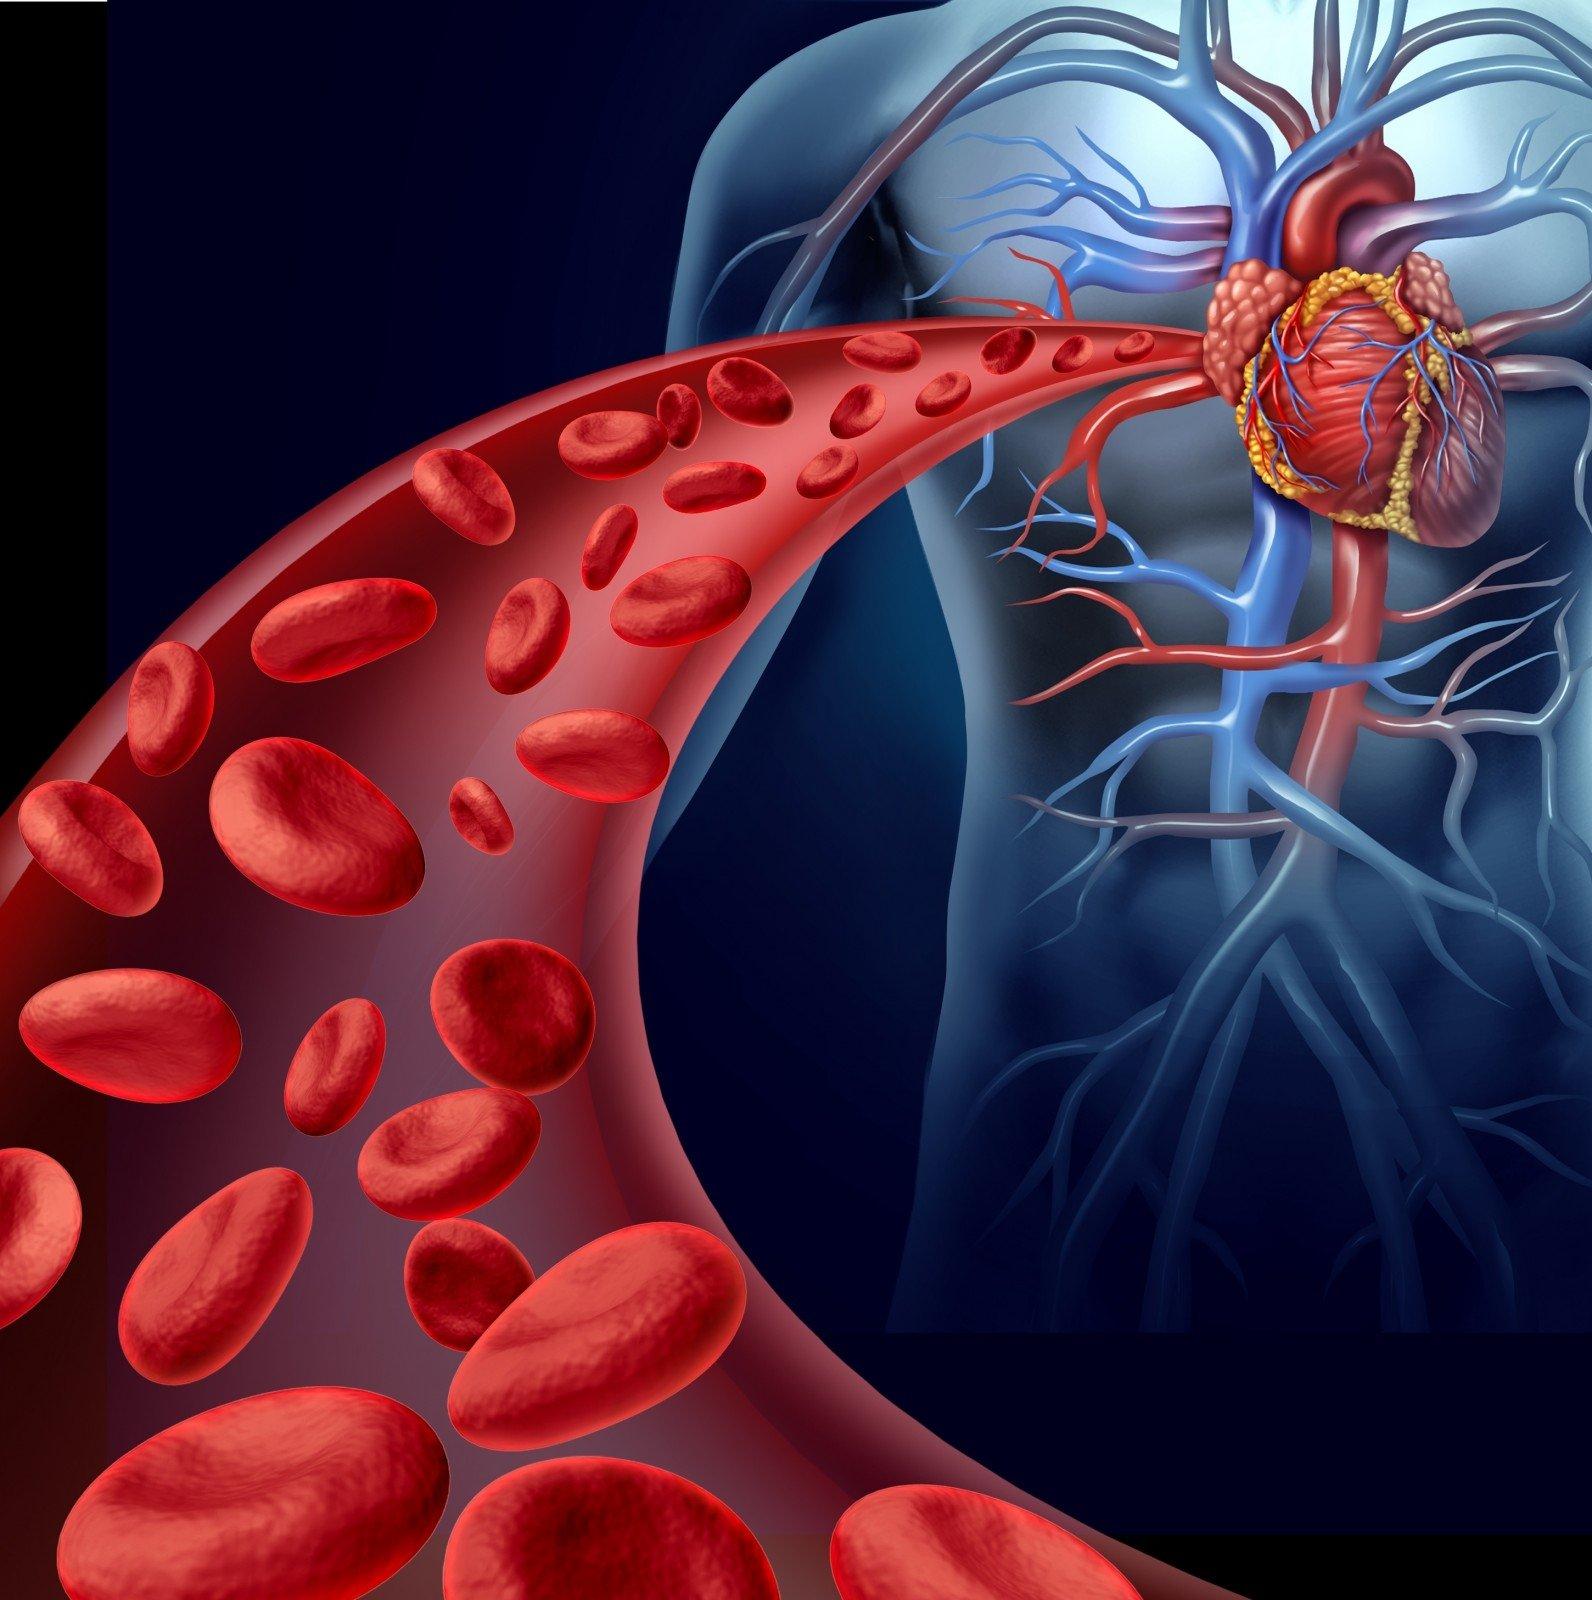 tavo širdies sveikata Naujoji Zelandija kalcio vaidmuo hipertenzijoje